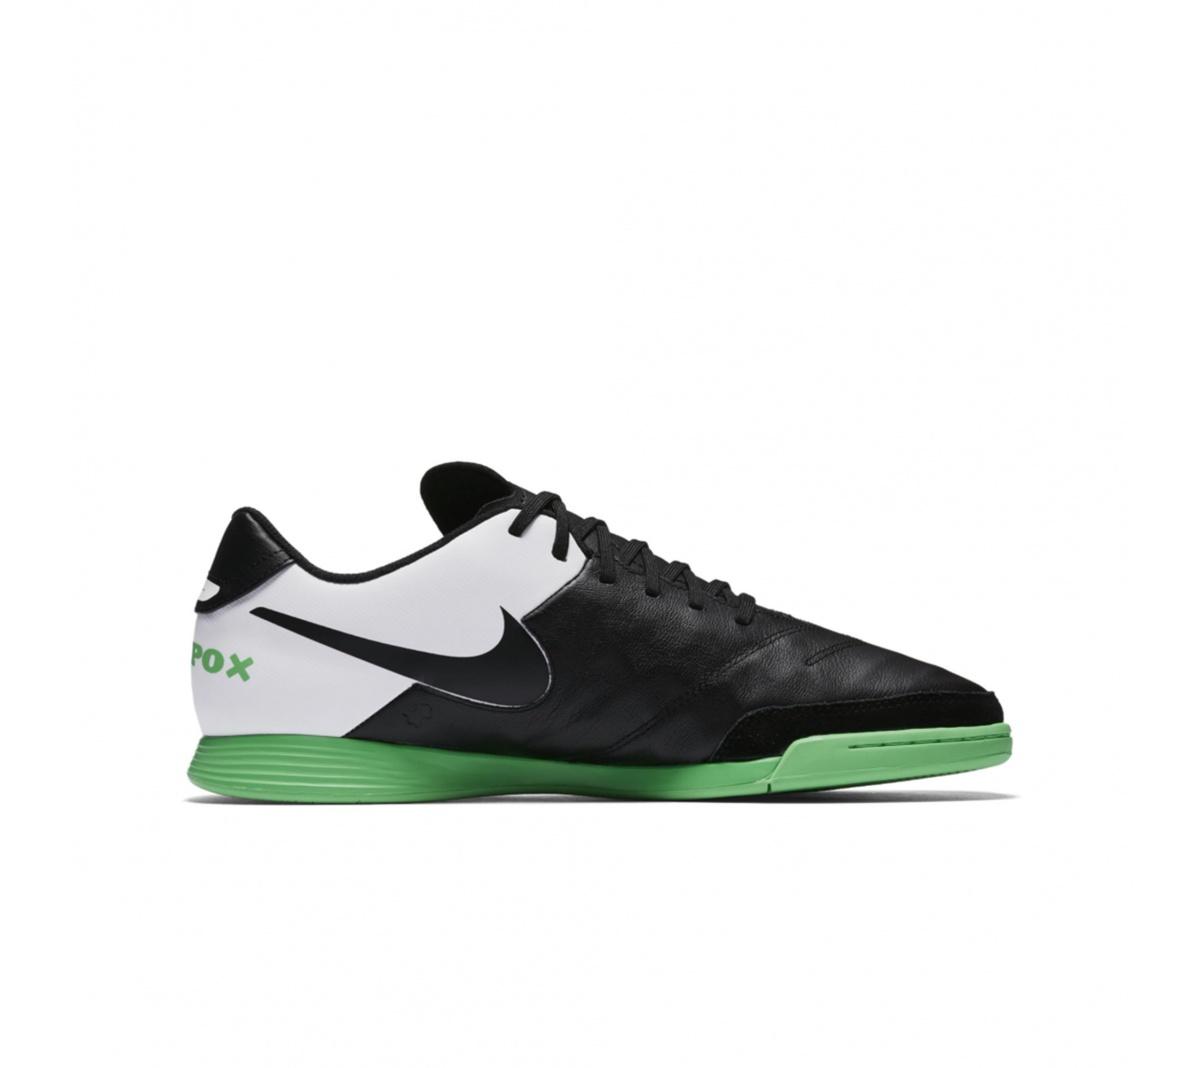 Tênis Nike Futsal TiempoX Gênio II Leather - Mundo do Futebol 3051abbebad57